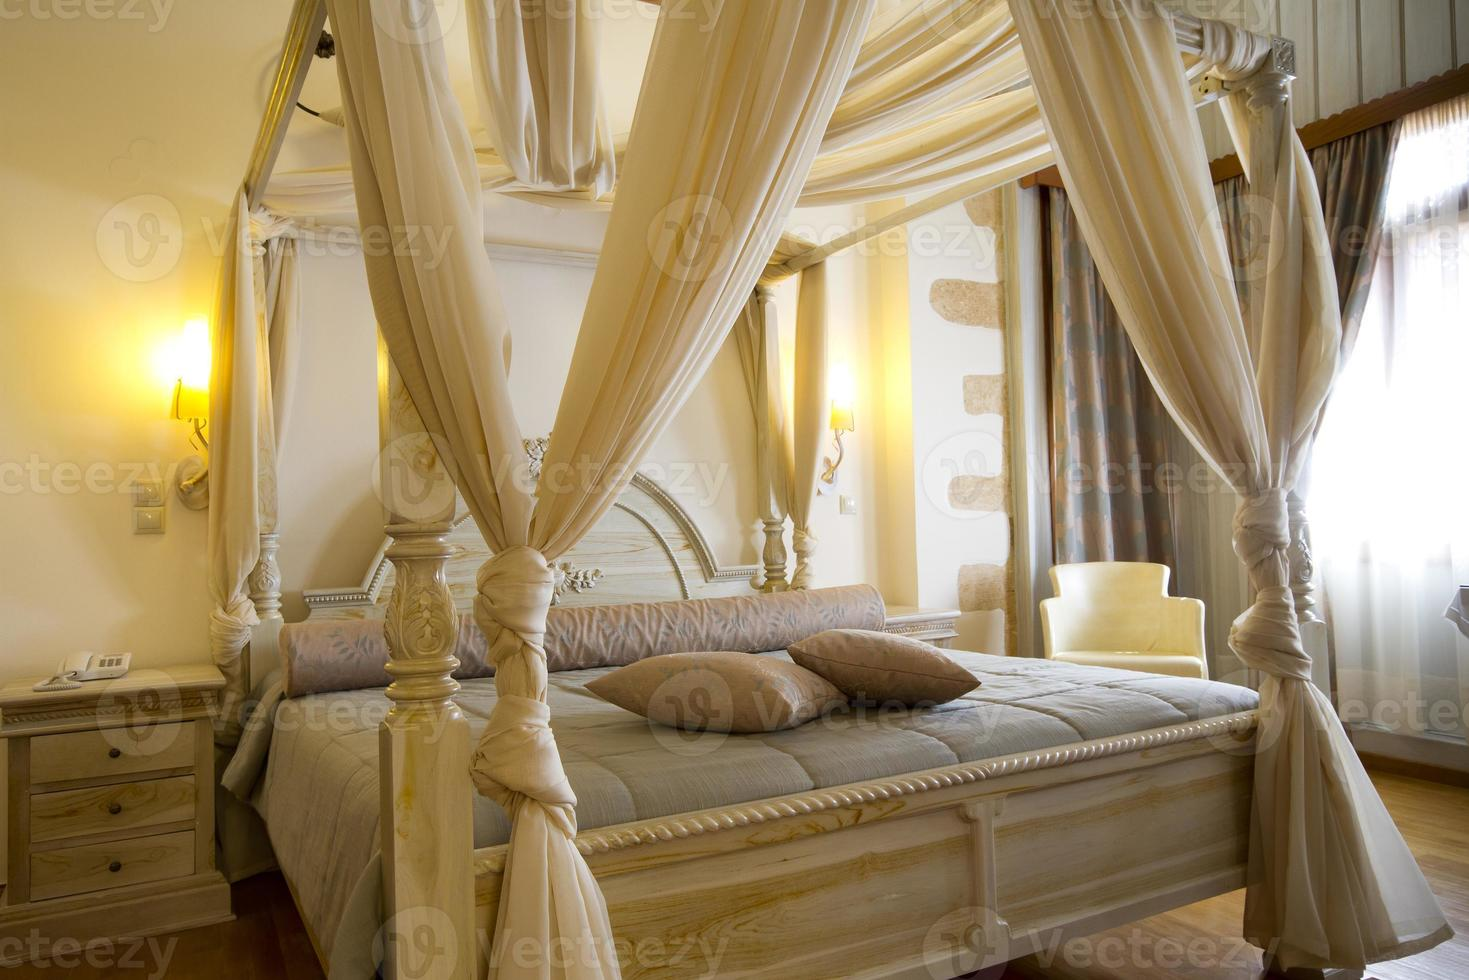 camera d'albergo classica e di lusso foto